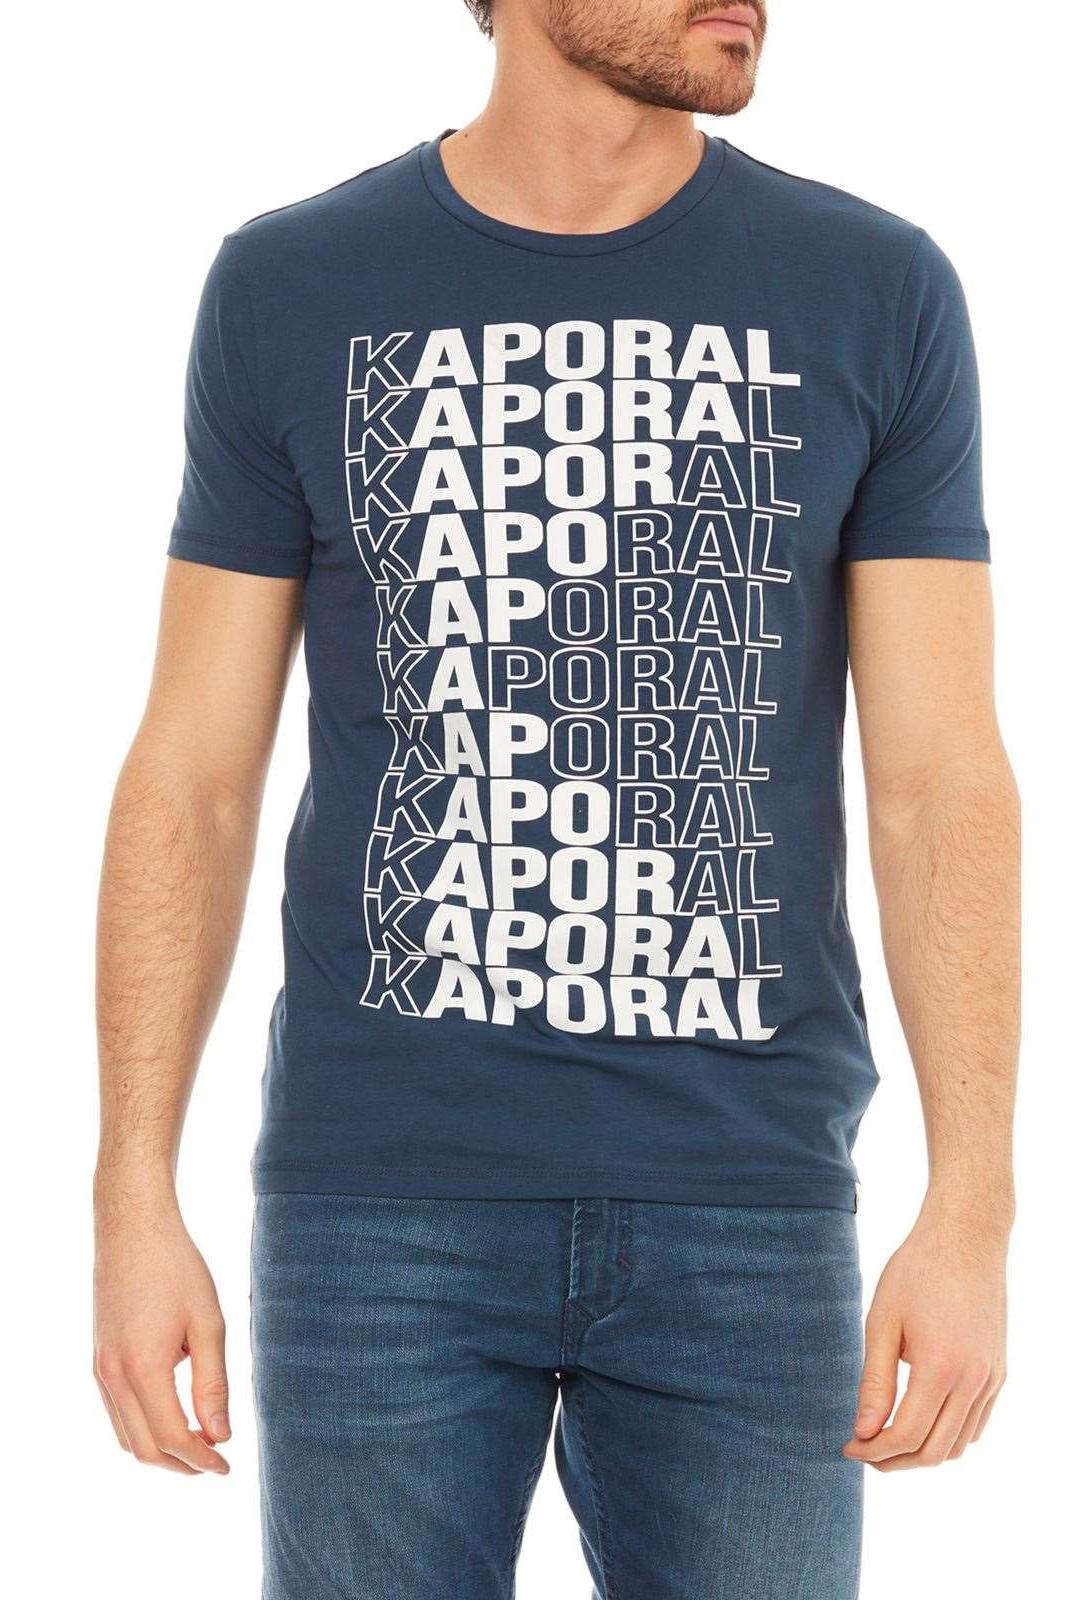 Tee-shirts  Kaporal MAVID BLUE US